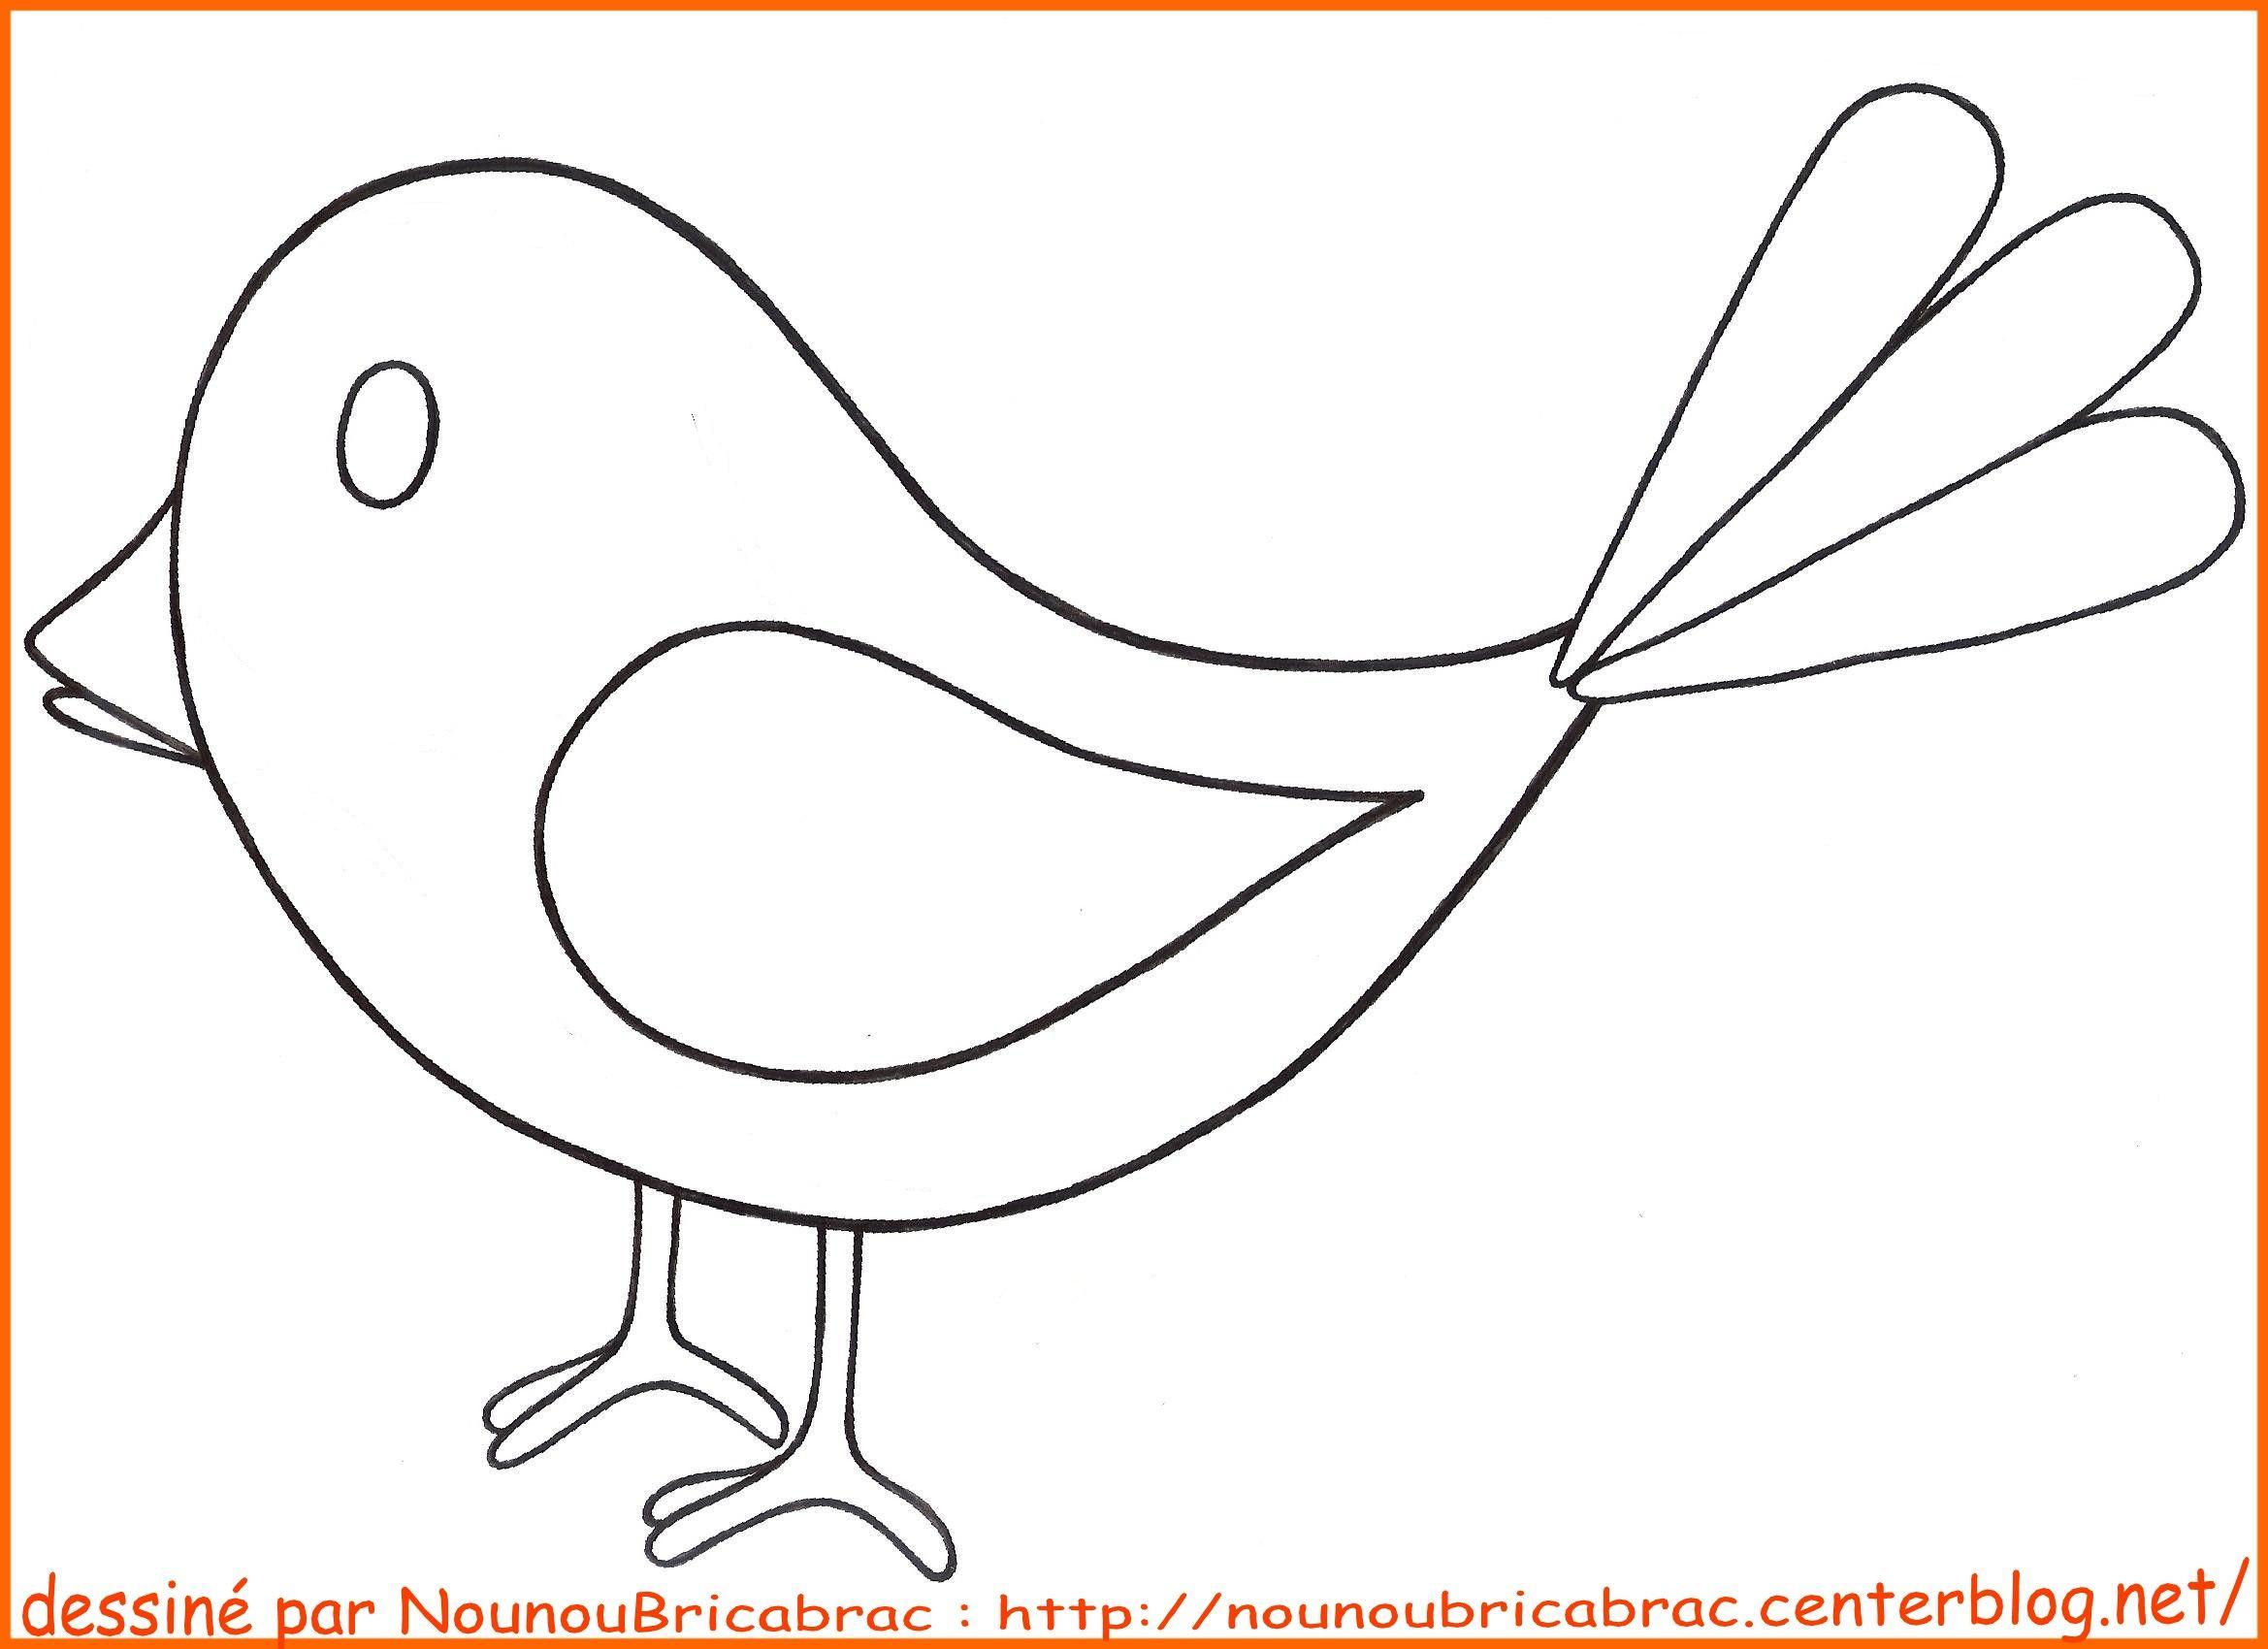 Apprendre a dessiner oiseau - Dessin d oiseau a imprimer ...